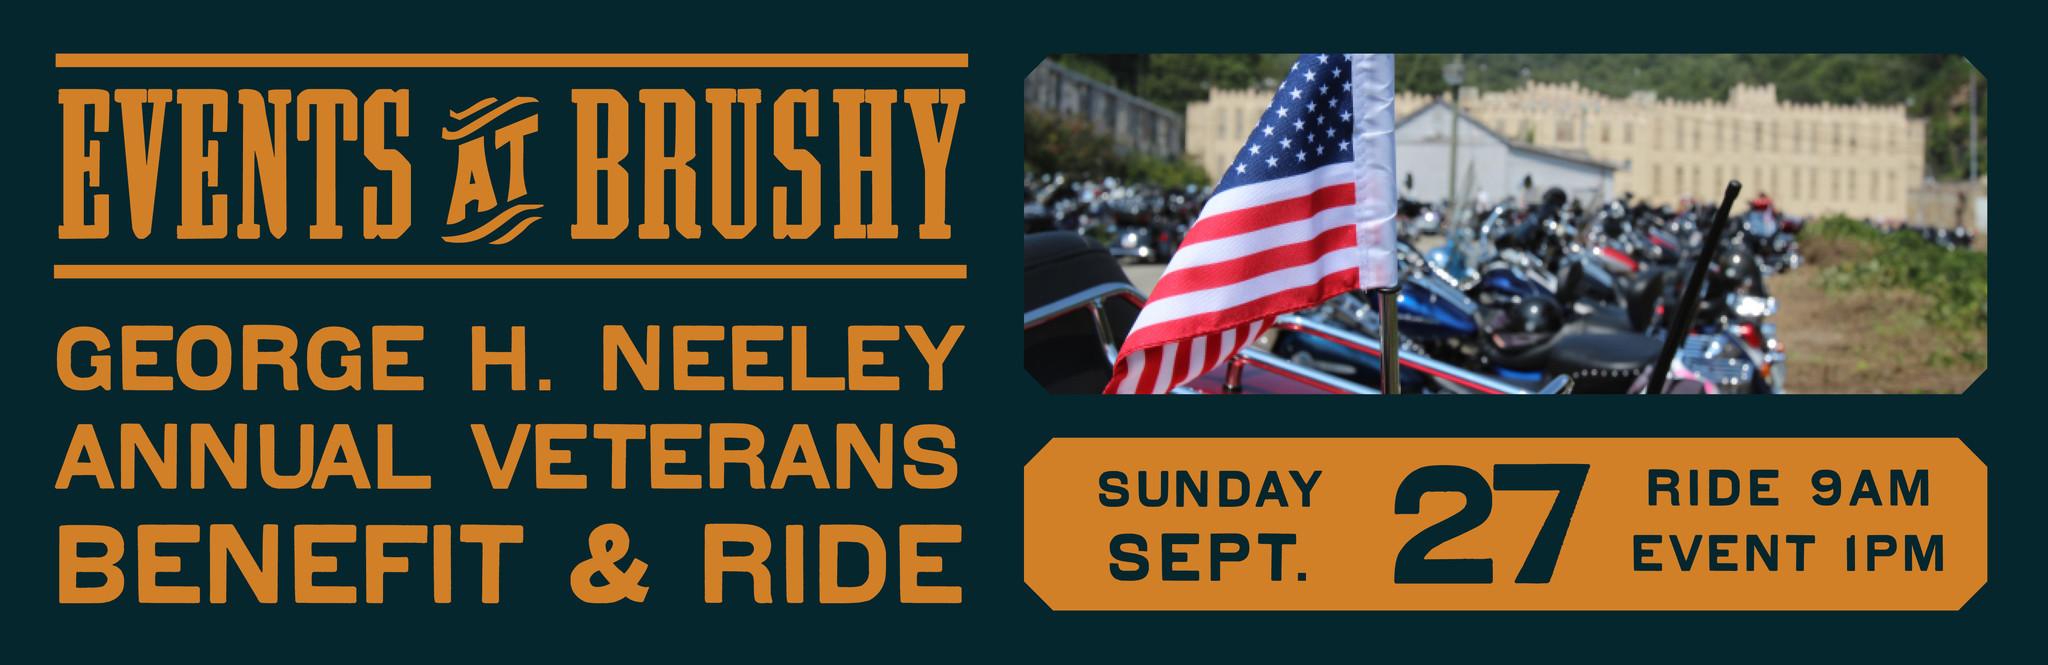 George H. Neeley Annual Veterans Benefit & Ride